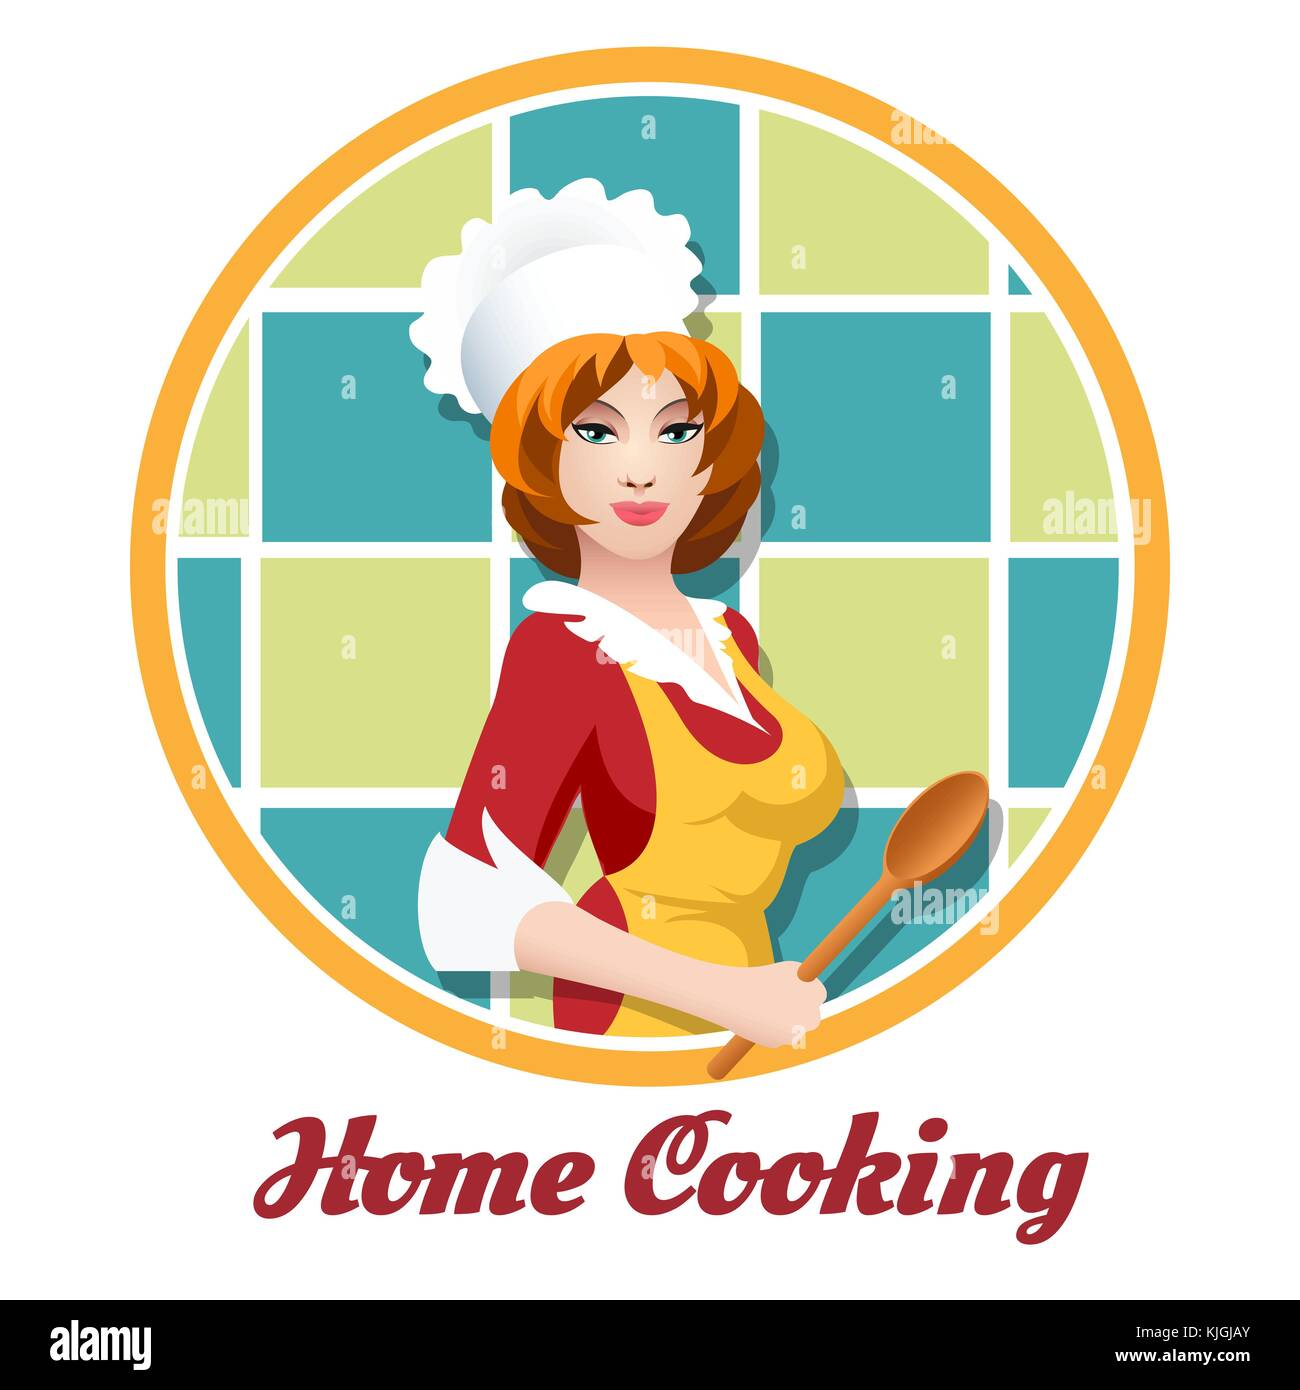 Retro Woman Cooking Stockfotos & Retro Woman Cooking